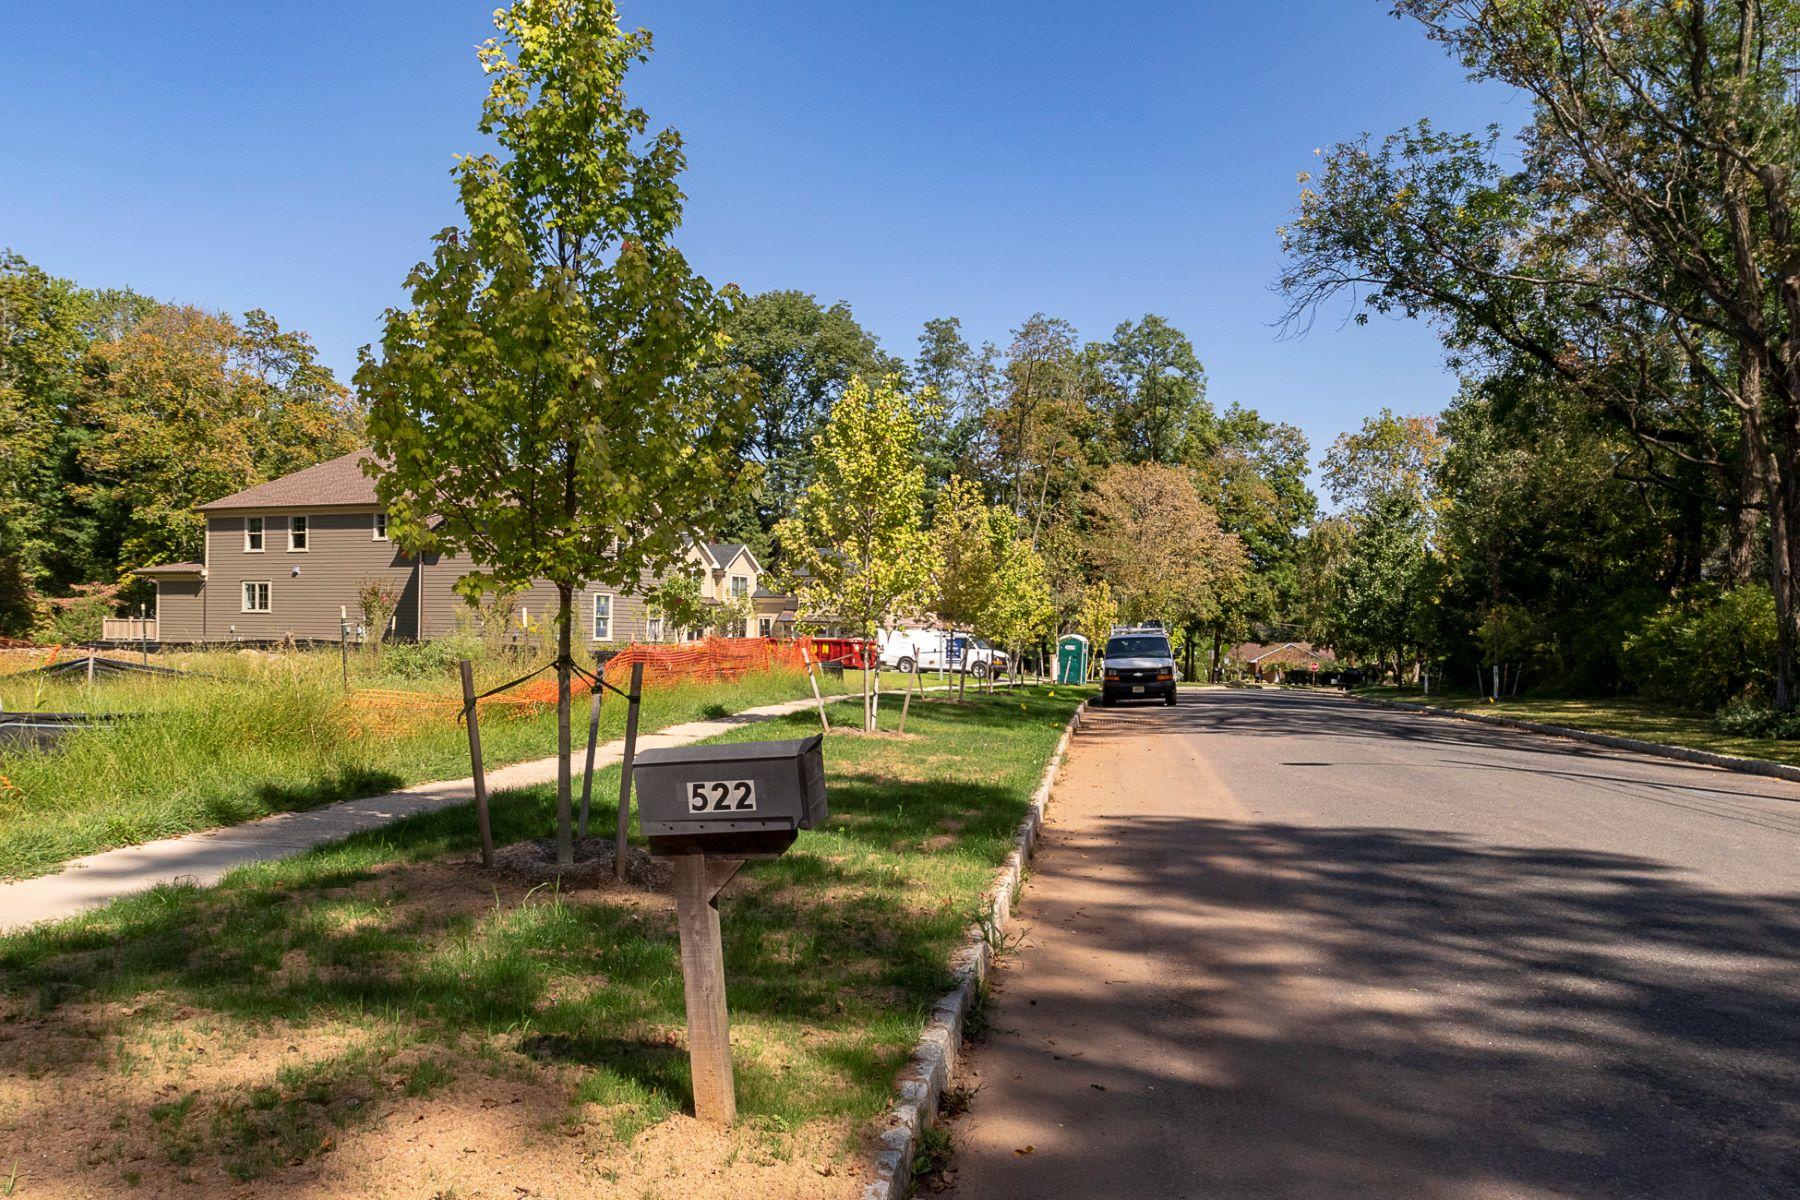 Additional photo for property listing at Building Lot in Riverside Neighborhood 522 Prospect Avenue, Princeton, Нью-Джерси 08540 Соединенные Штаты